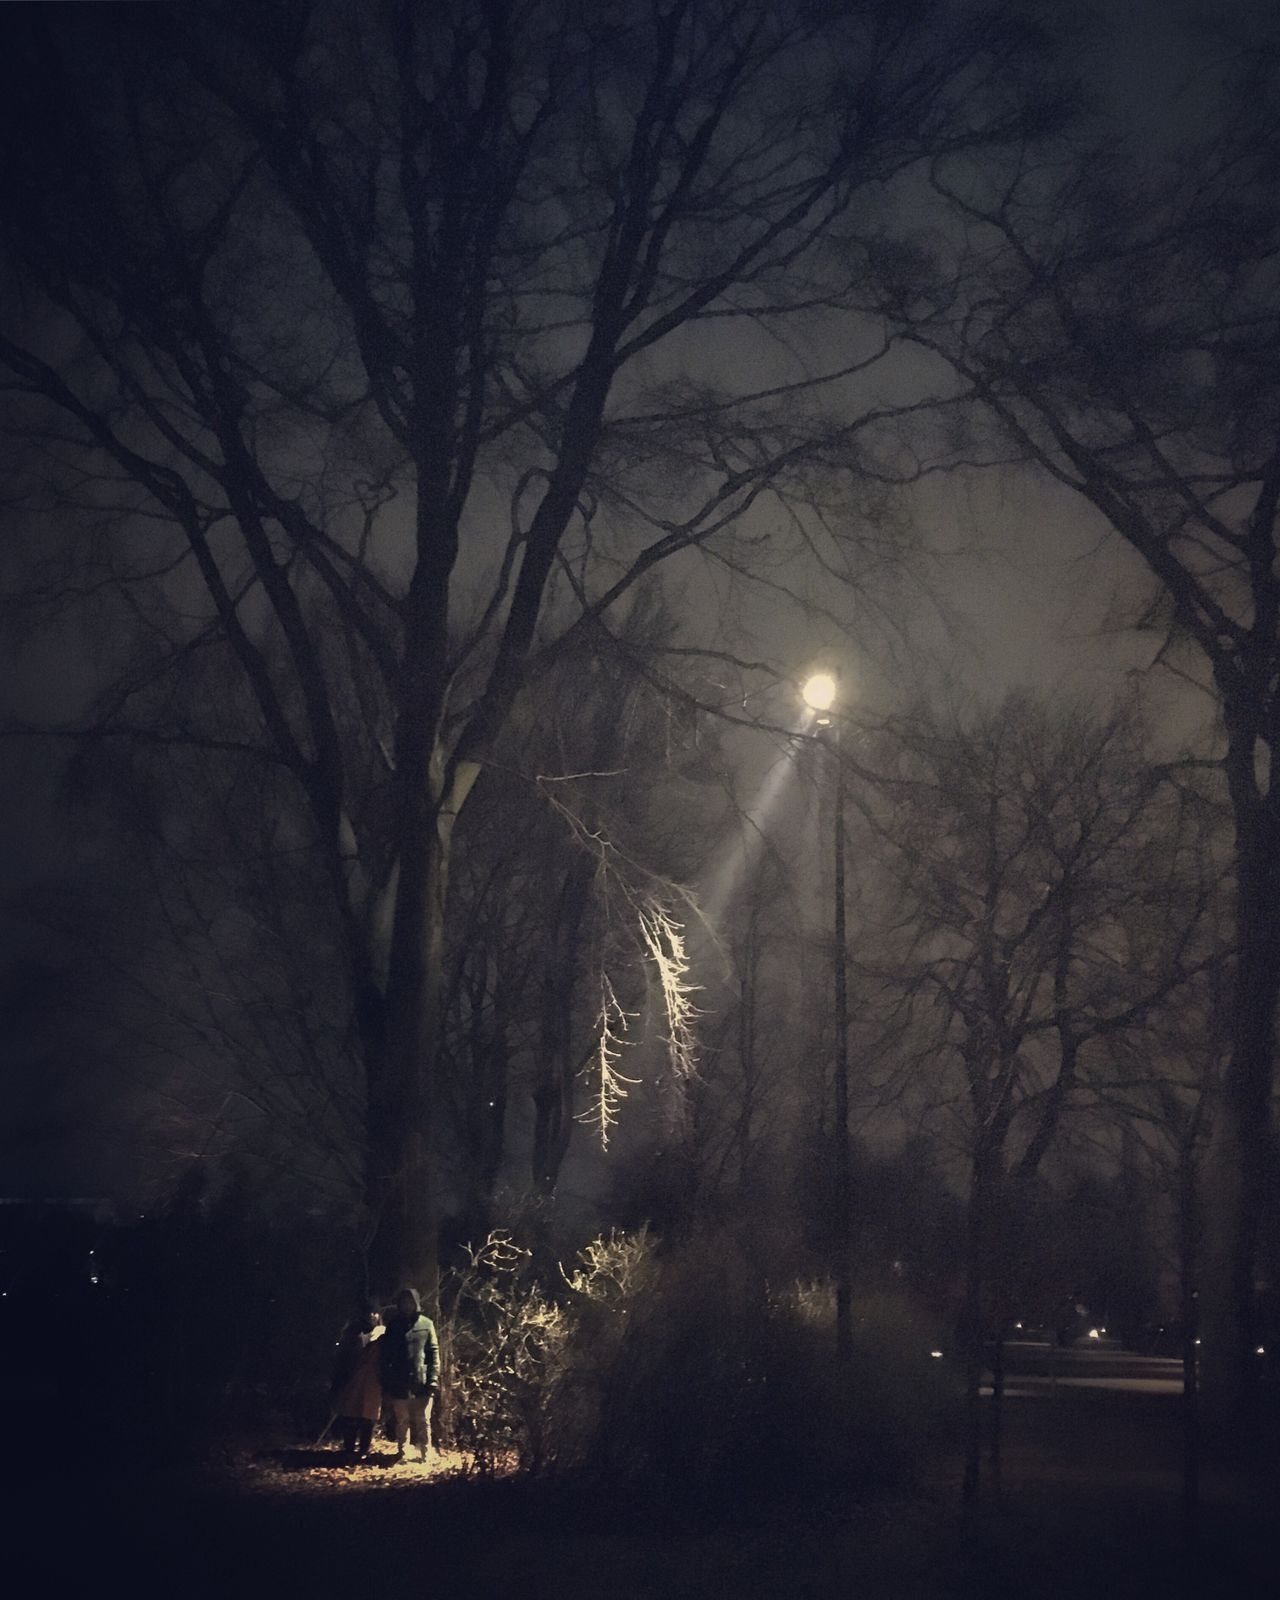 Out For A Walk Tree Bare Tree Night Silhouette Outdoors Illuminated Winter Fog Nature Creepy Moody Copenhagen Copenhagen, Denmark Denmark Dark